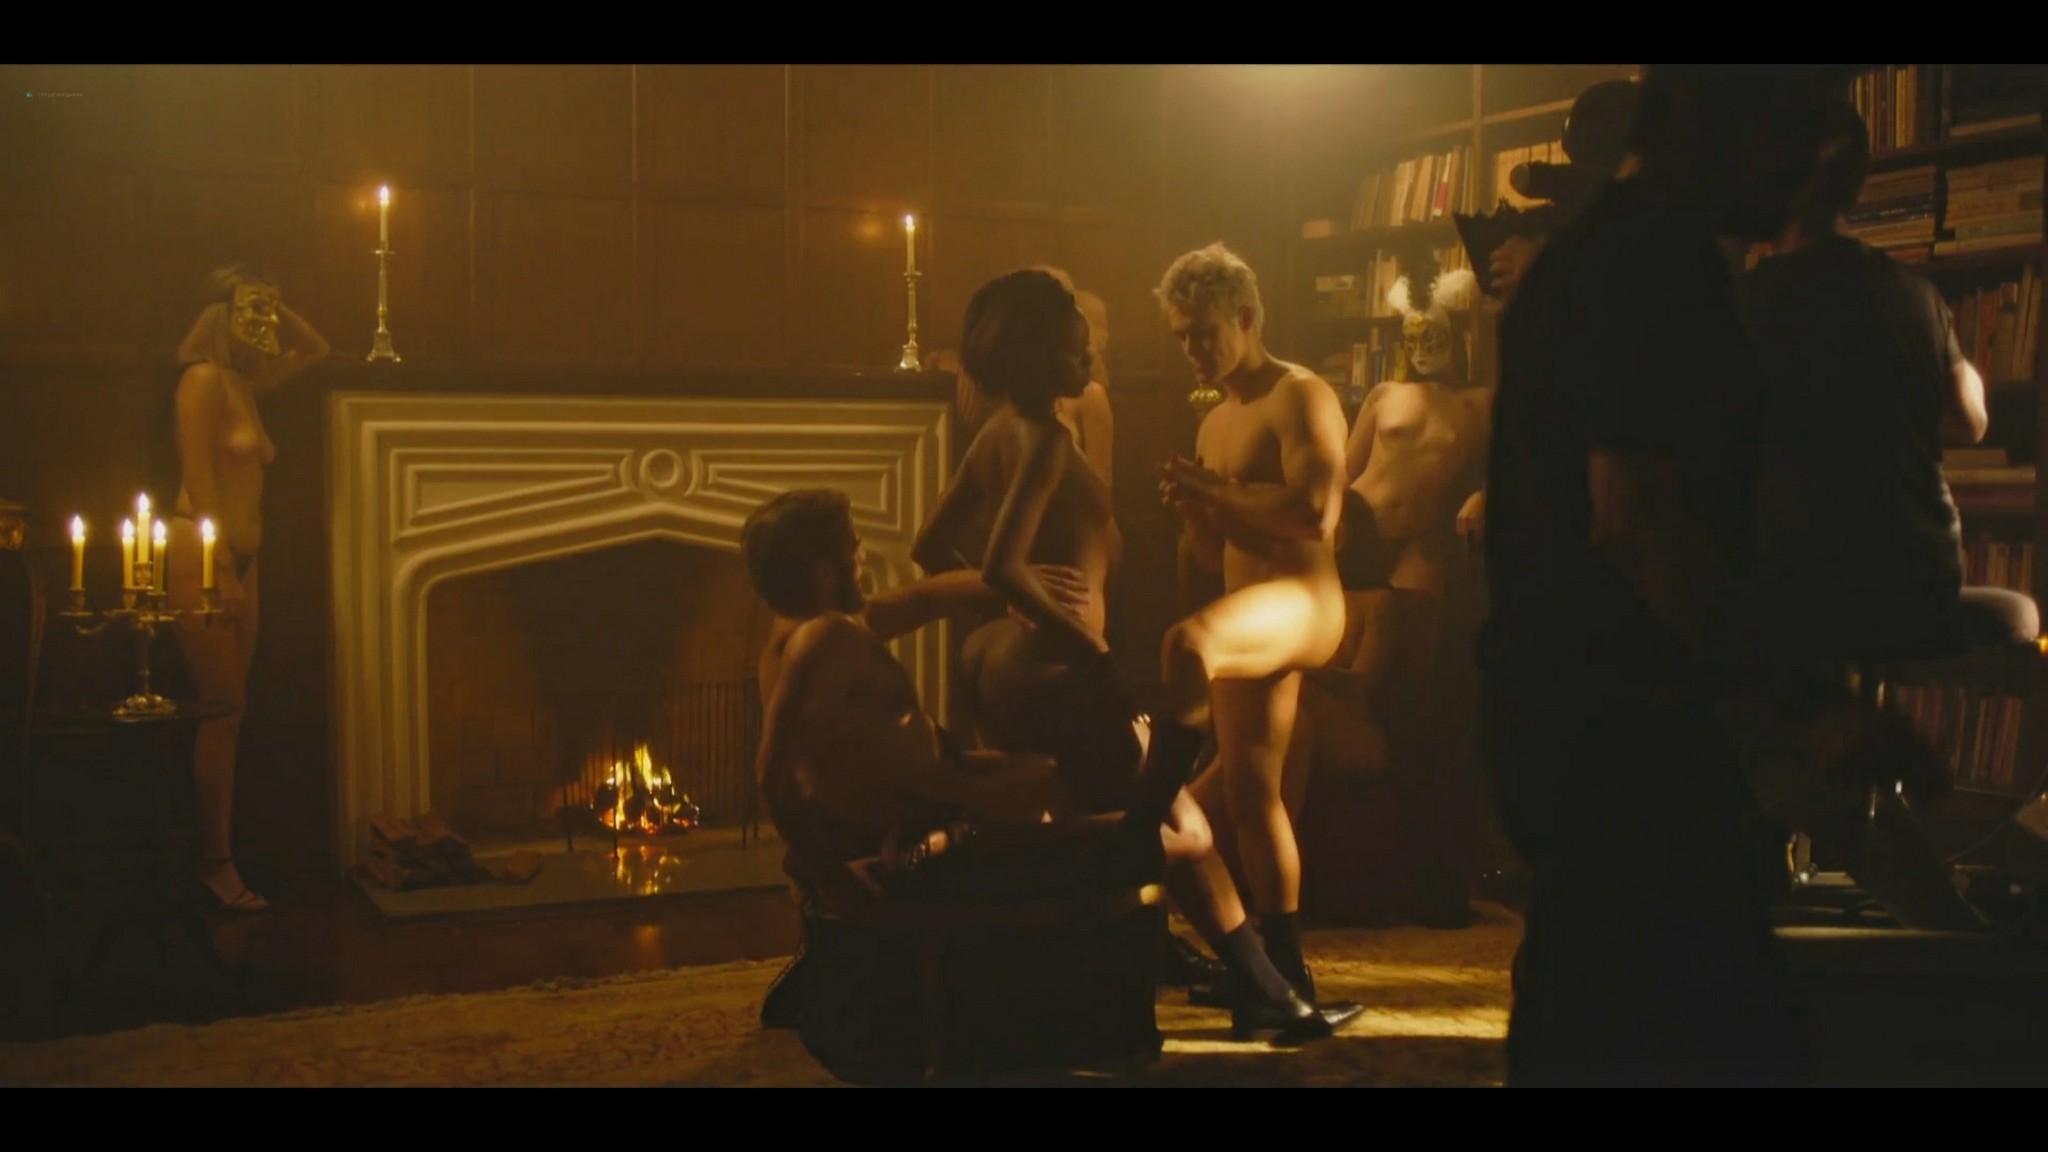 Brunna Martins nude Carolina Ferraz Natalia Lage and others nude orgy and sexy Hard 2021 s3e1 2 1080p Web 9